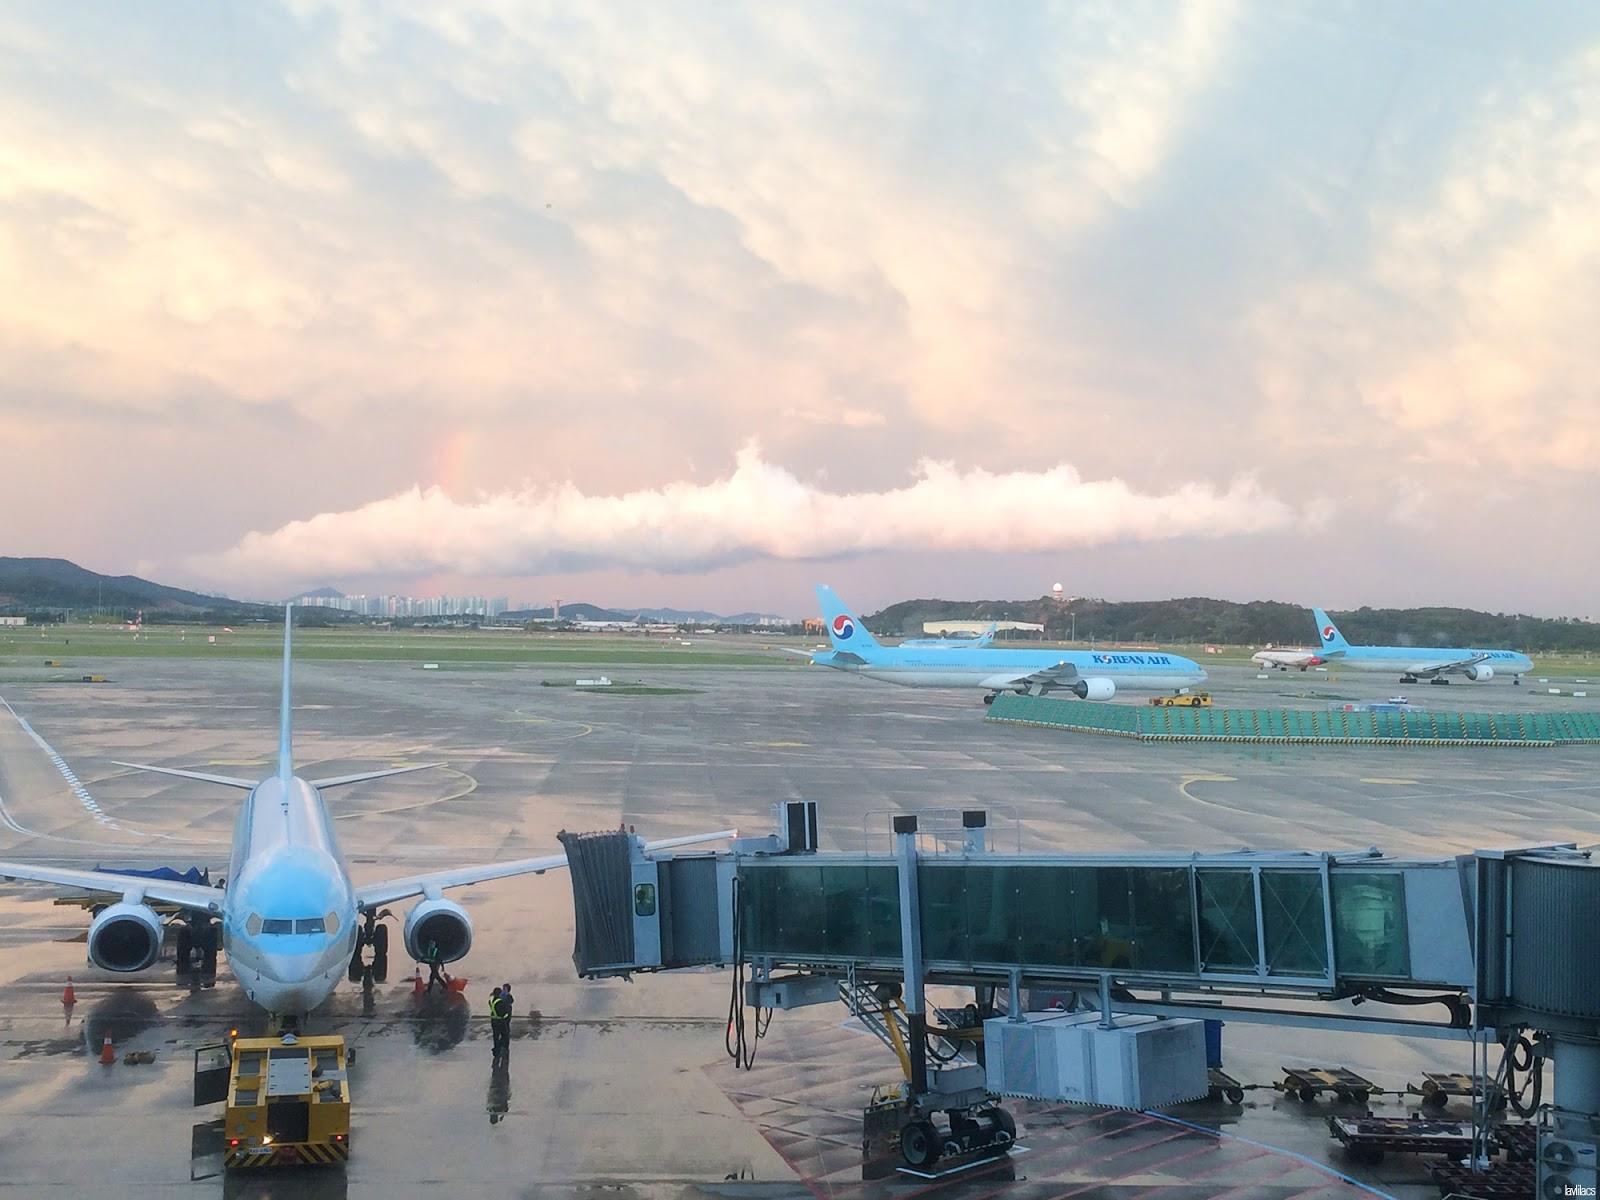 Seoul, Korea - Summer Study Abroad 2014 - Brightness after a storm